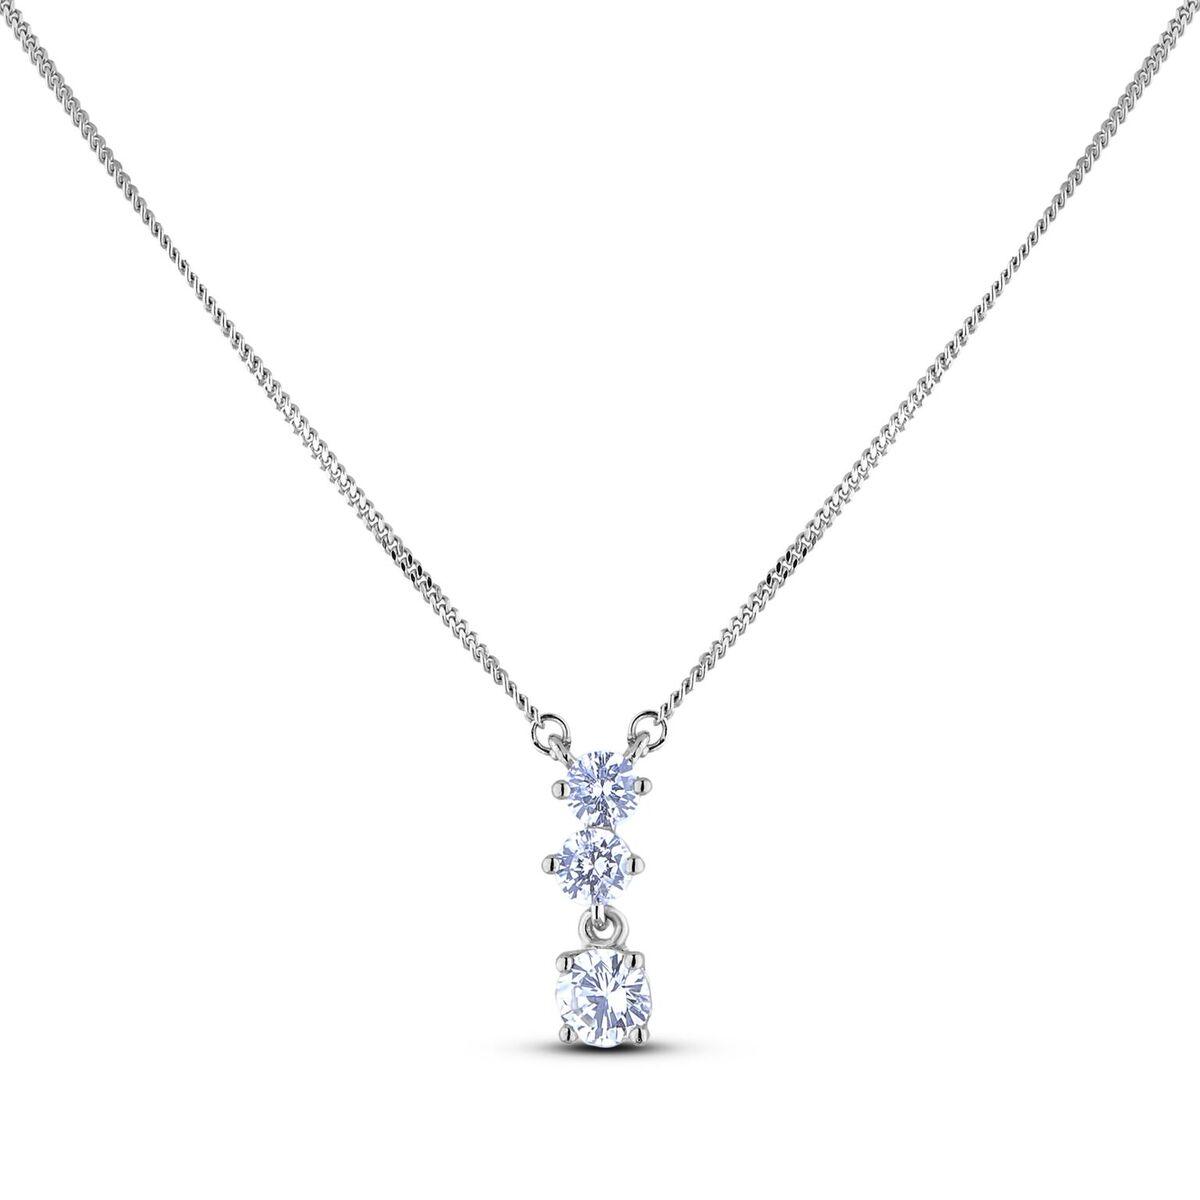 Diamond Necklaces SJL-SEC-MX-ND2776 (Pendants)